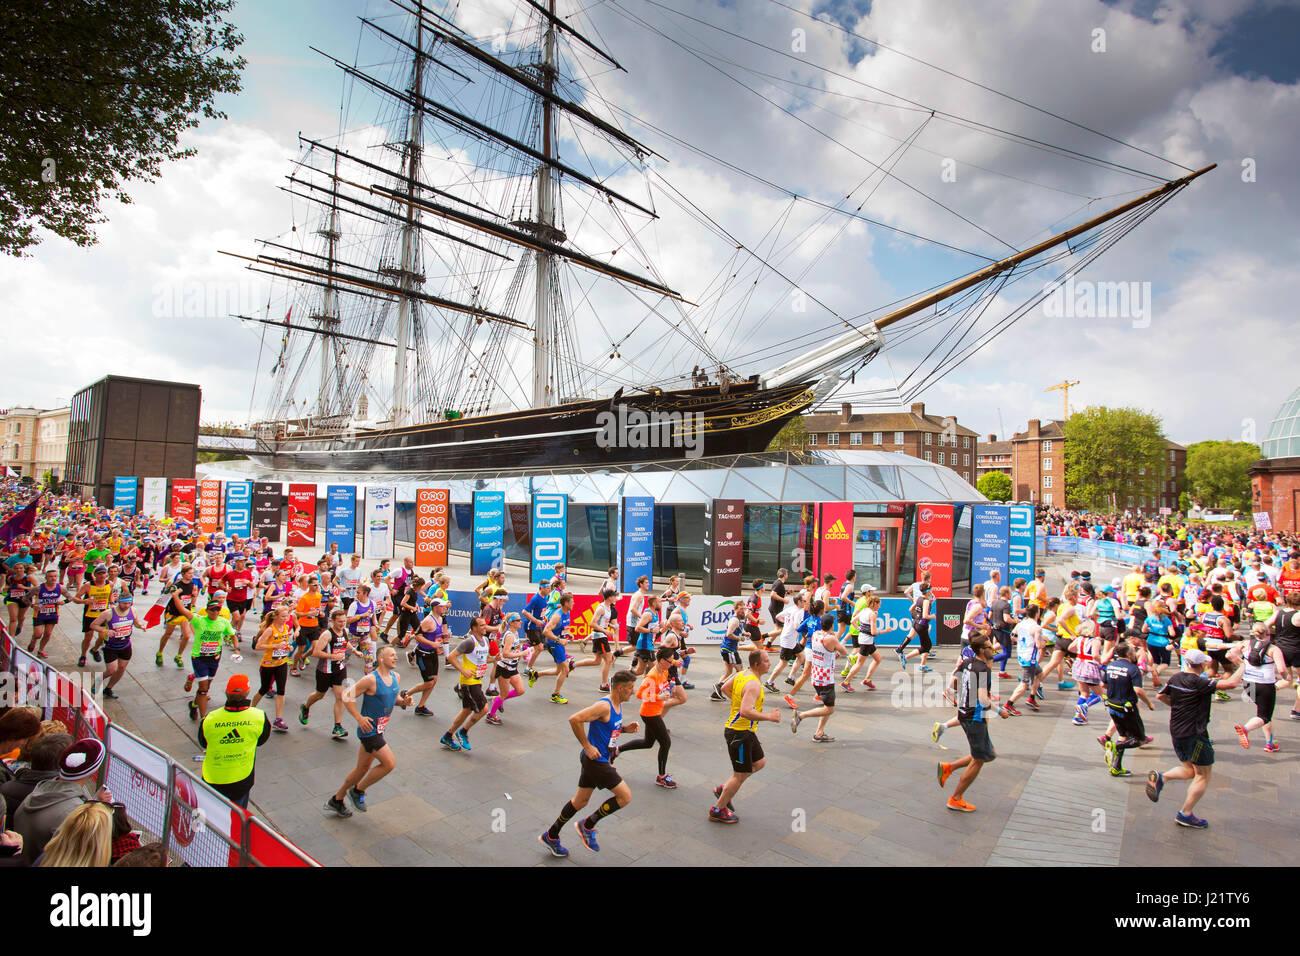 London, UK. 23. April 2017. Teilnahme an der Virgin London Marathon 2017. Cutty Sark vorbei abgebildet. Bildnachweis: Stockfoto